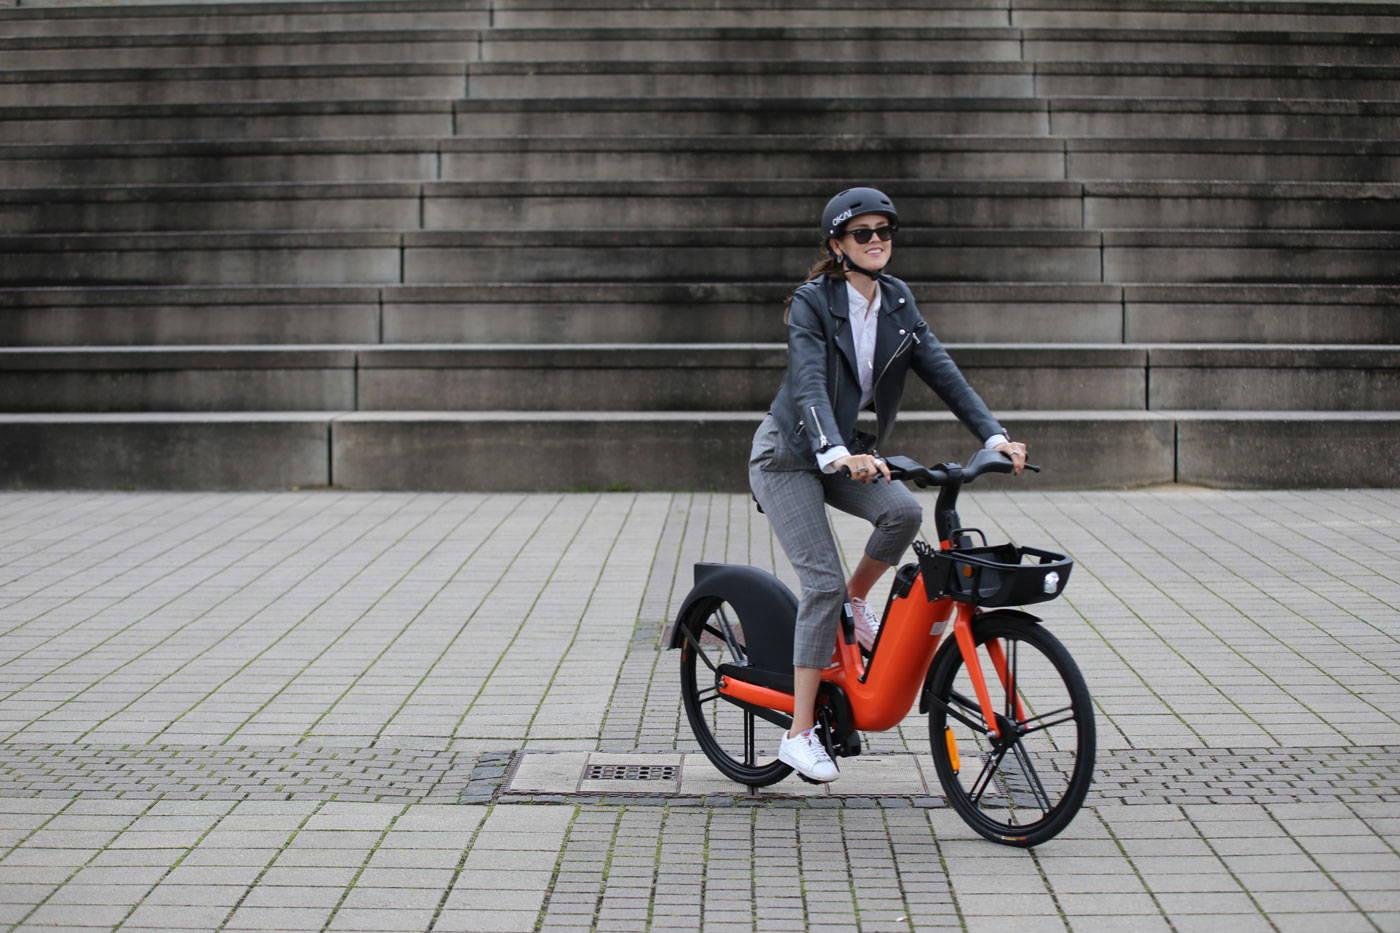 okai-eb100-ebike-woman-riding-on-street